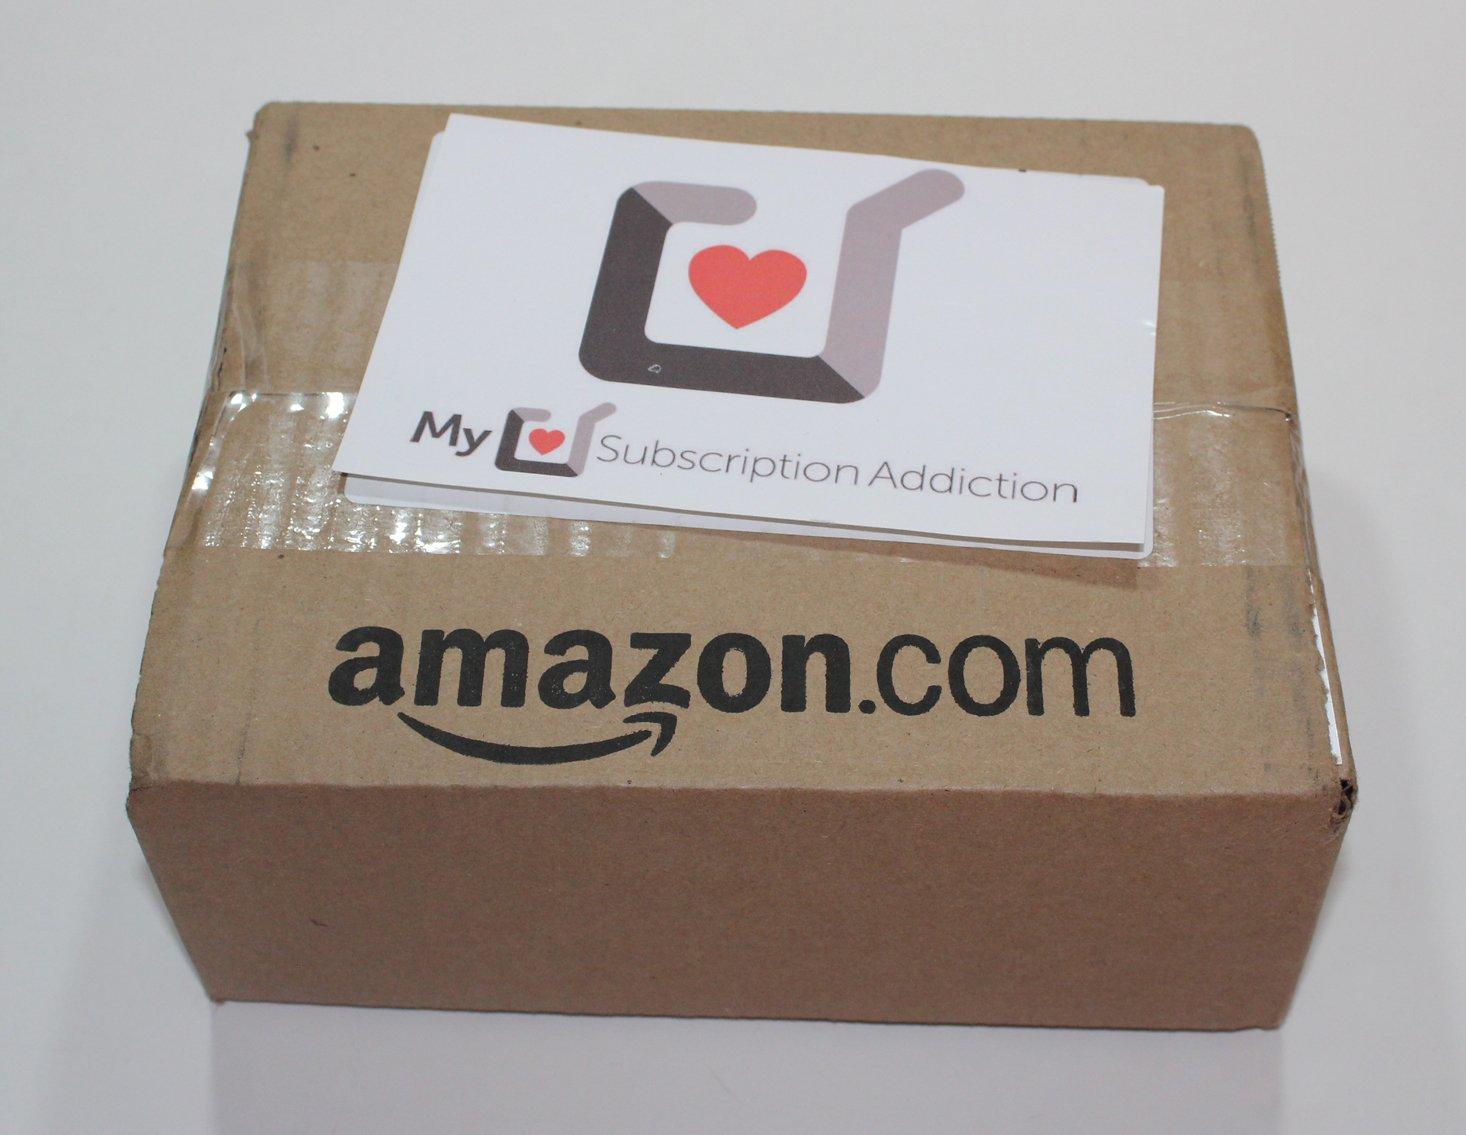 Amazon-bsn-on-april-2017-box